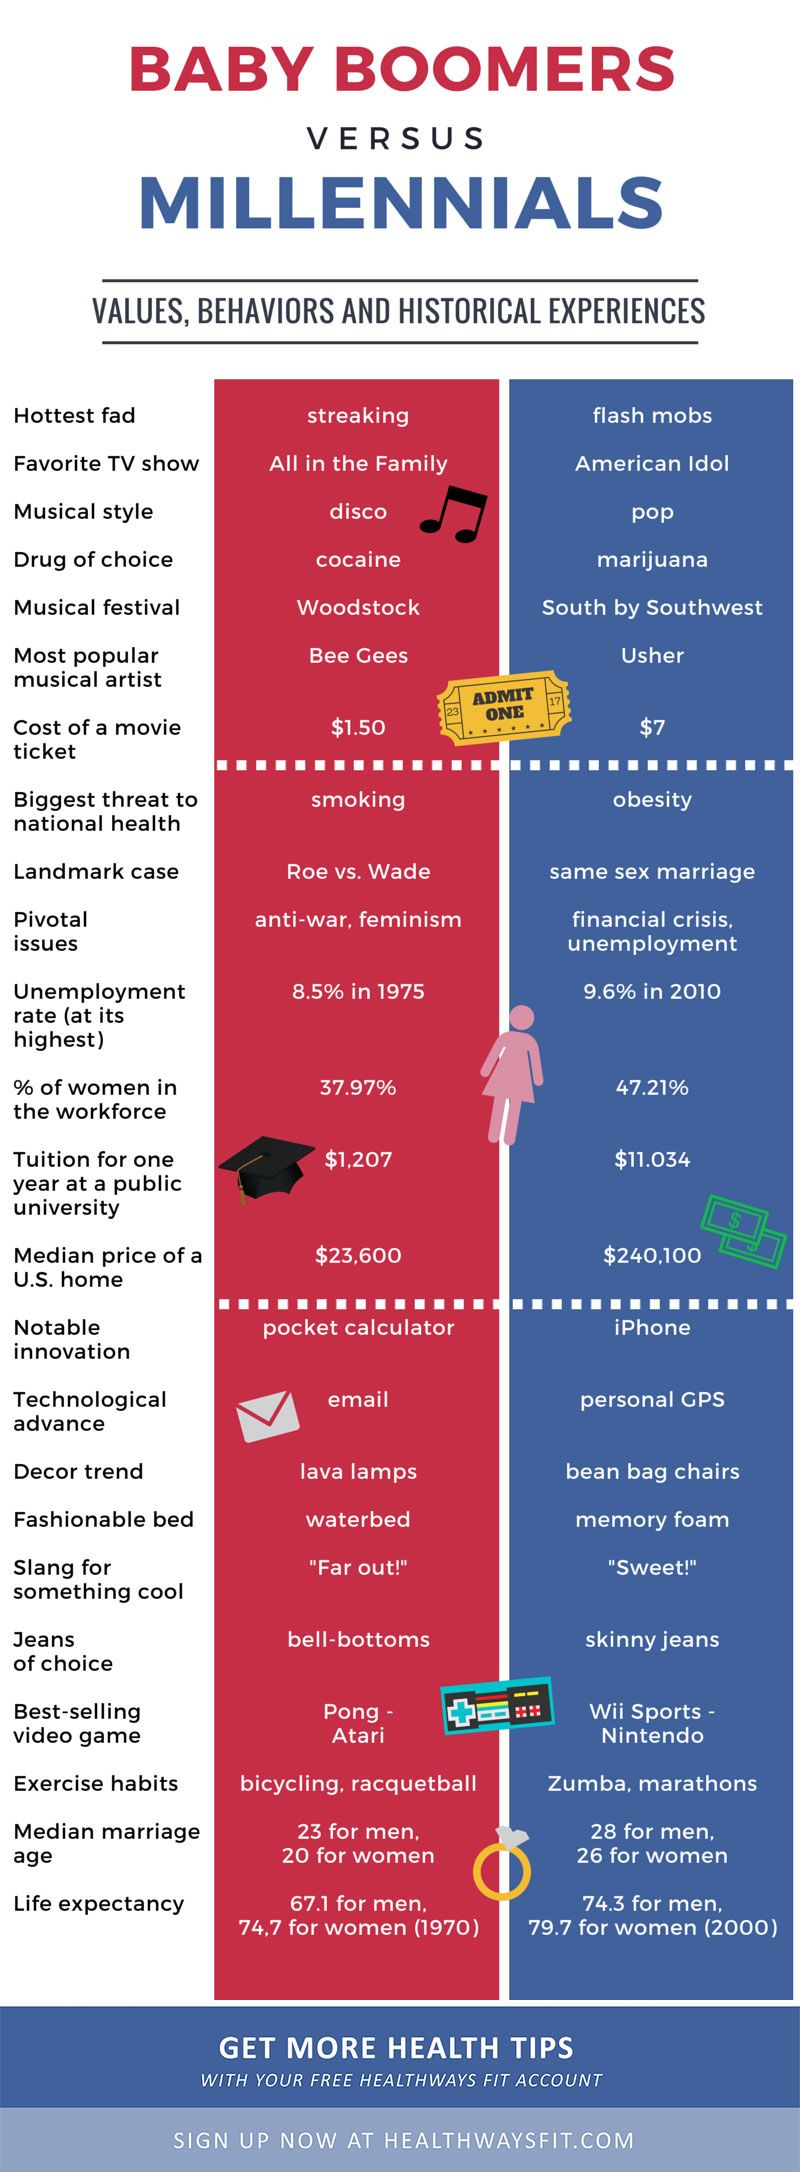 Baby Boomers vs. Millennials Infographic | We